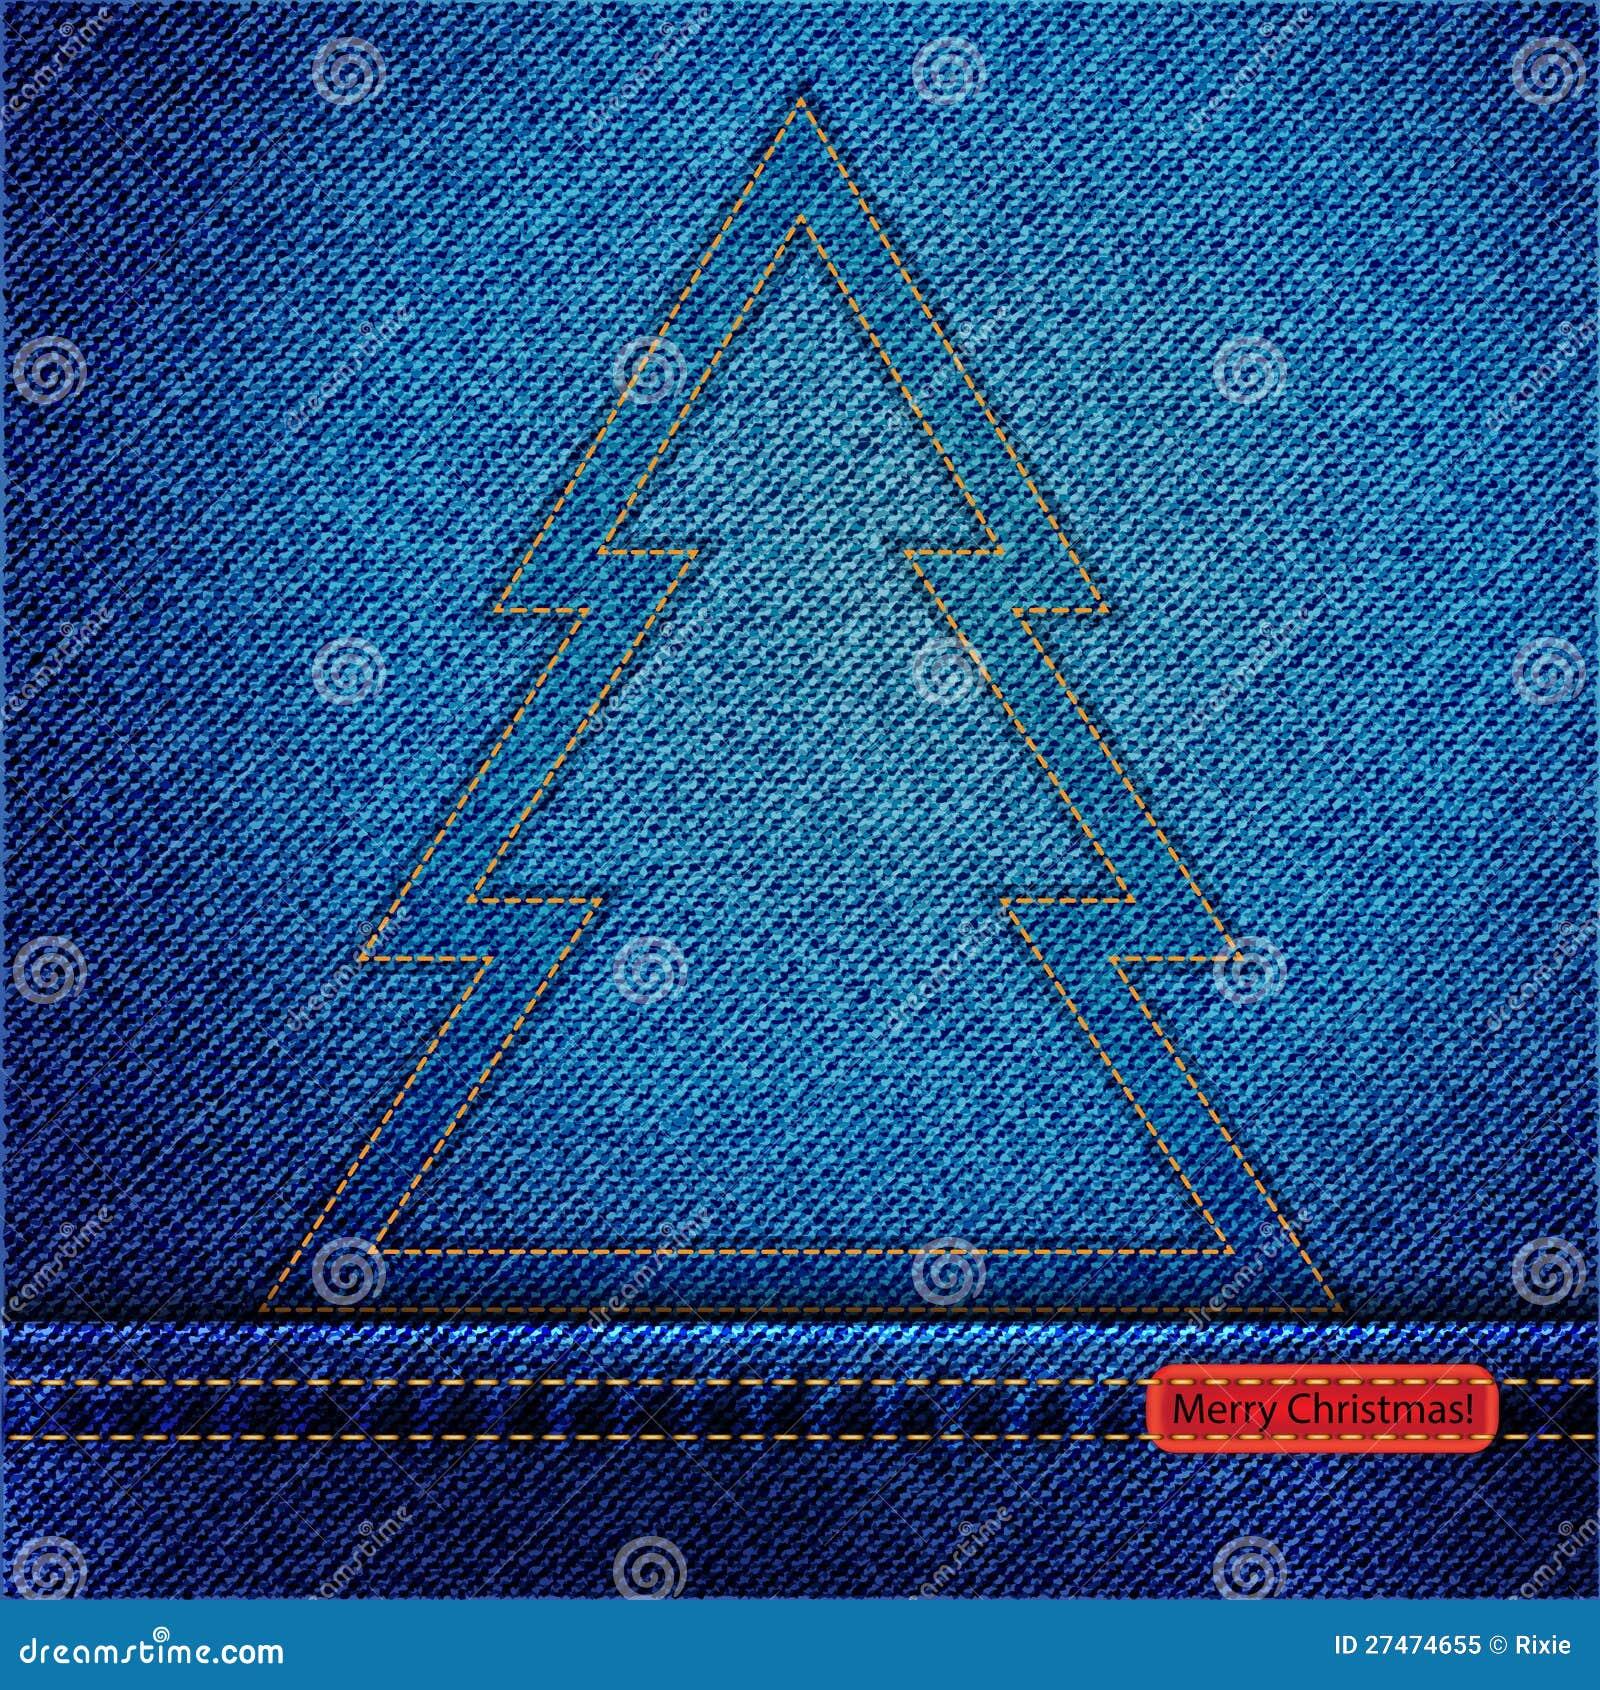 Christmas Tree Outlines Denim christmas tree outline